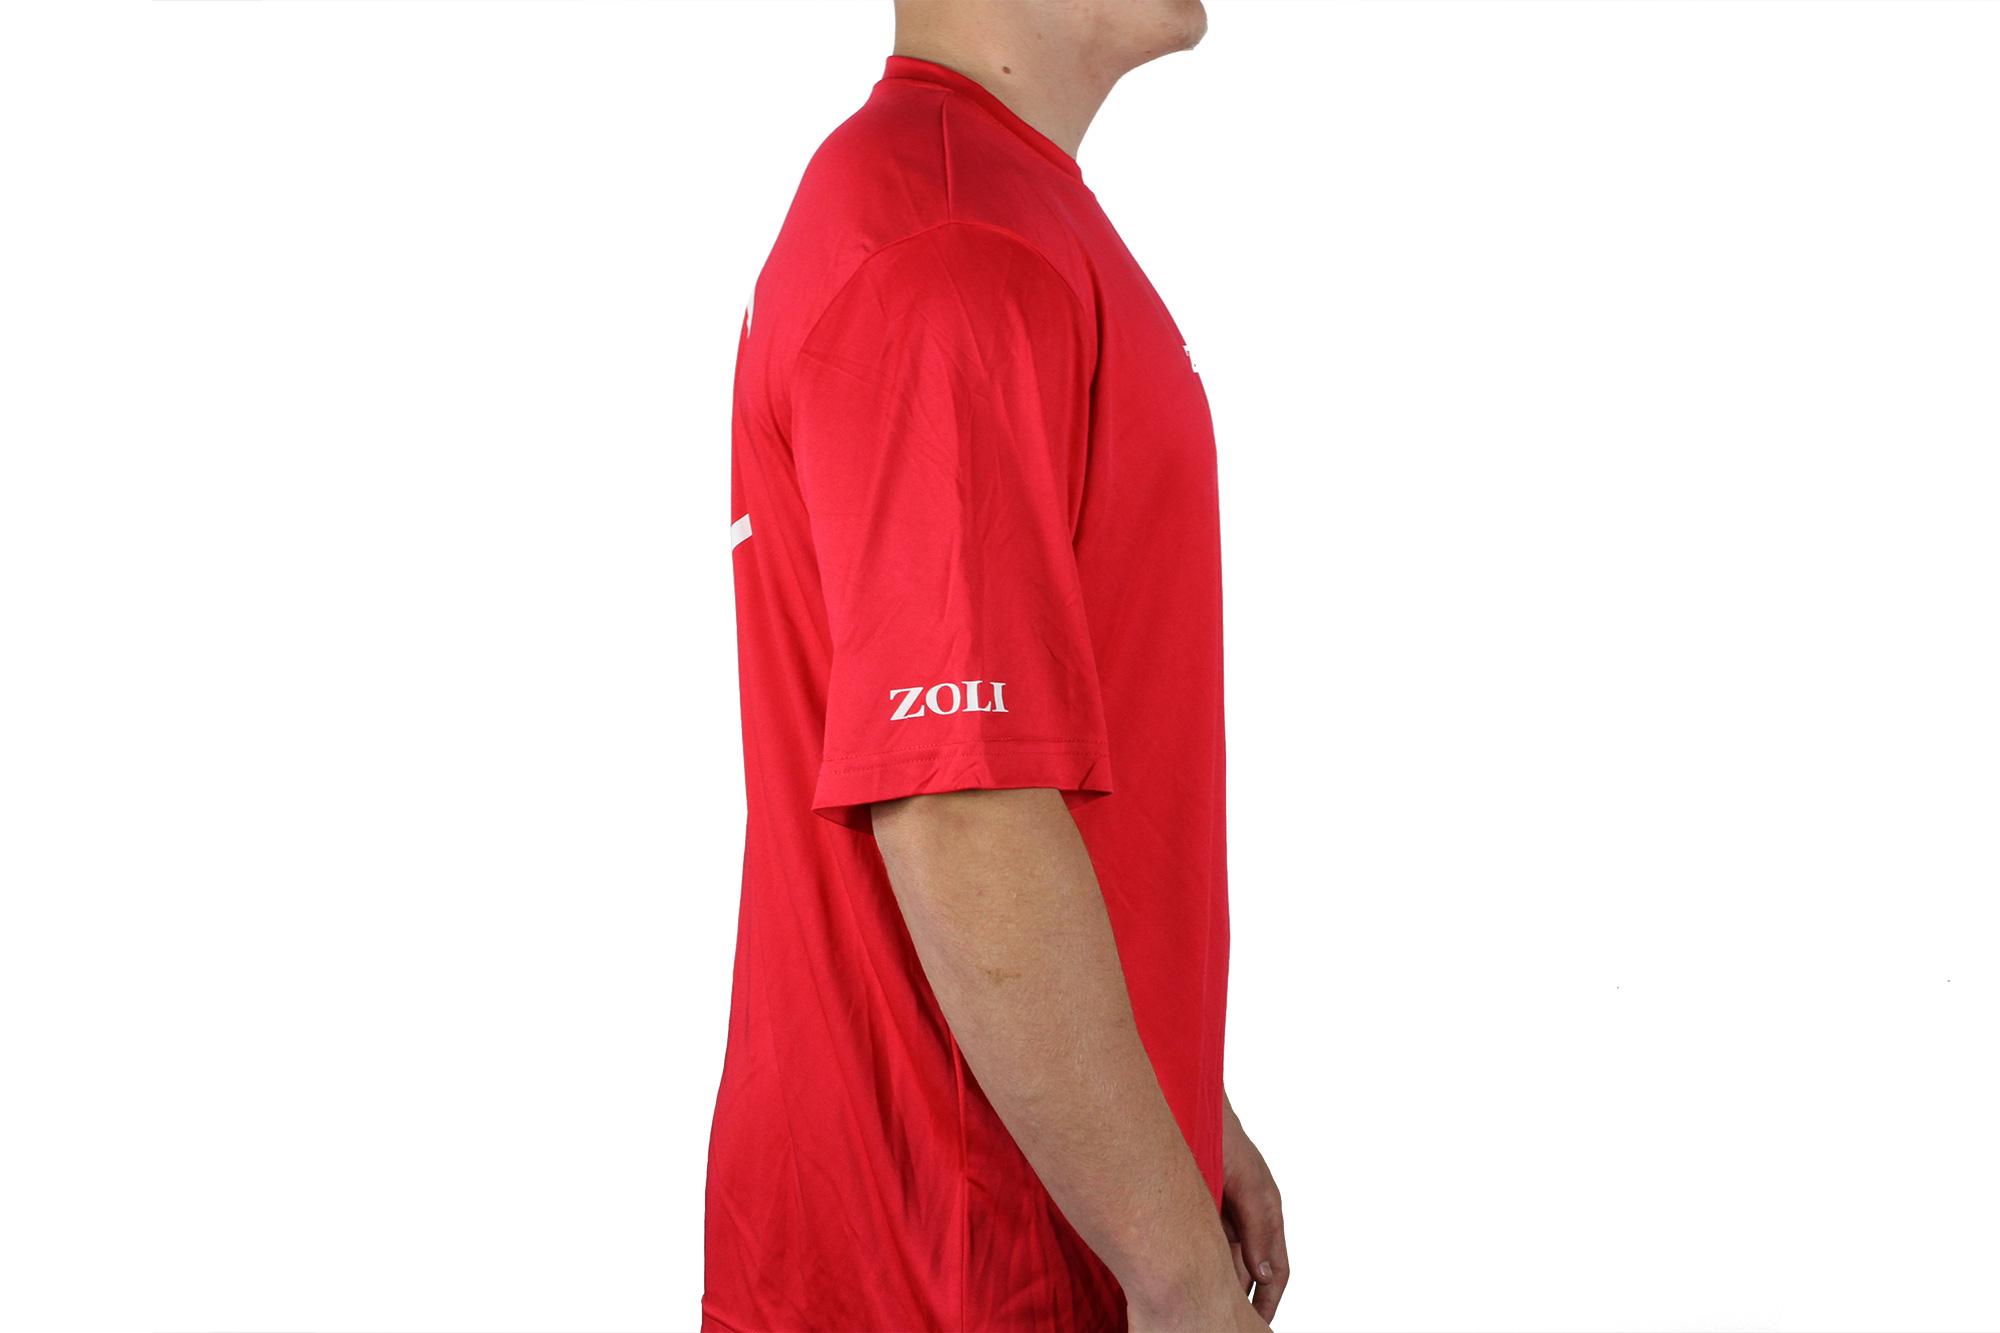 Zoli Z-GUN Red Sport Shirt right side